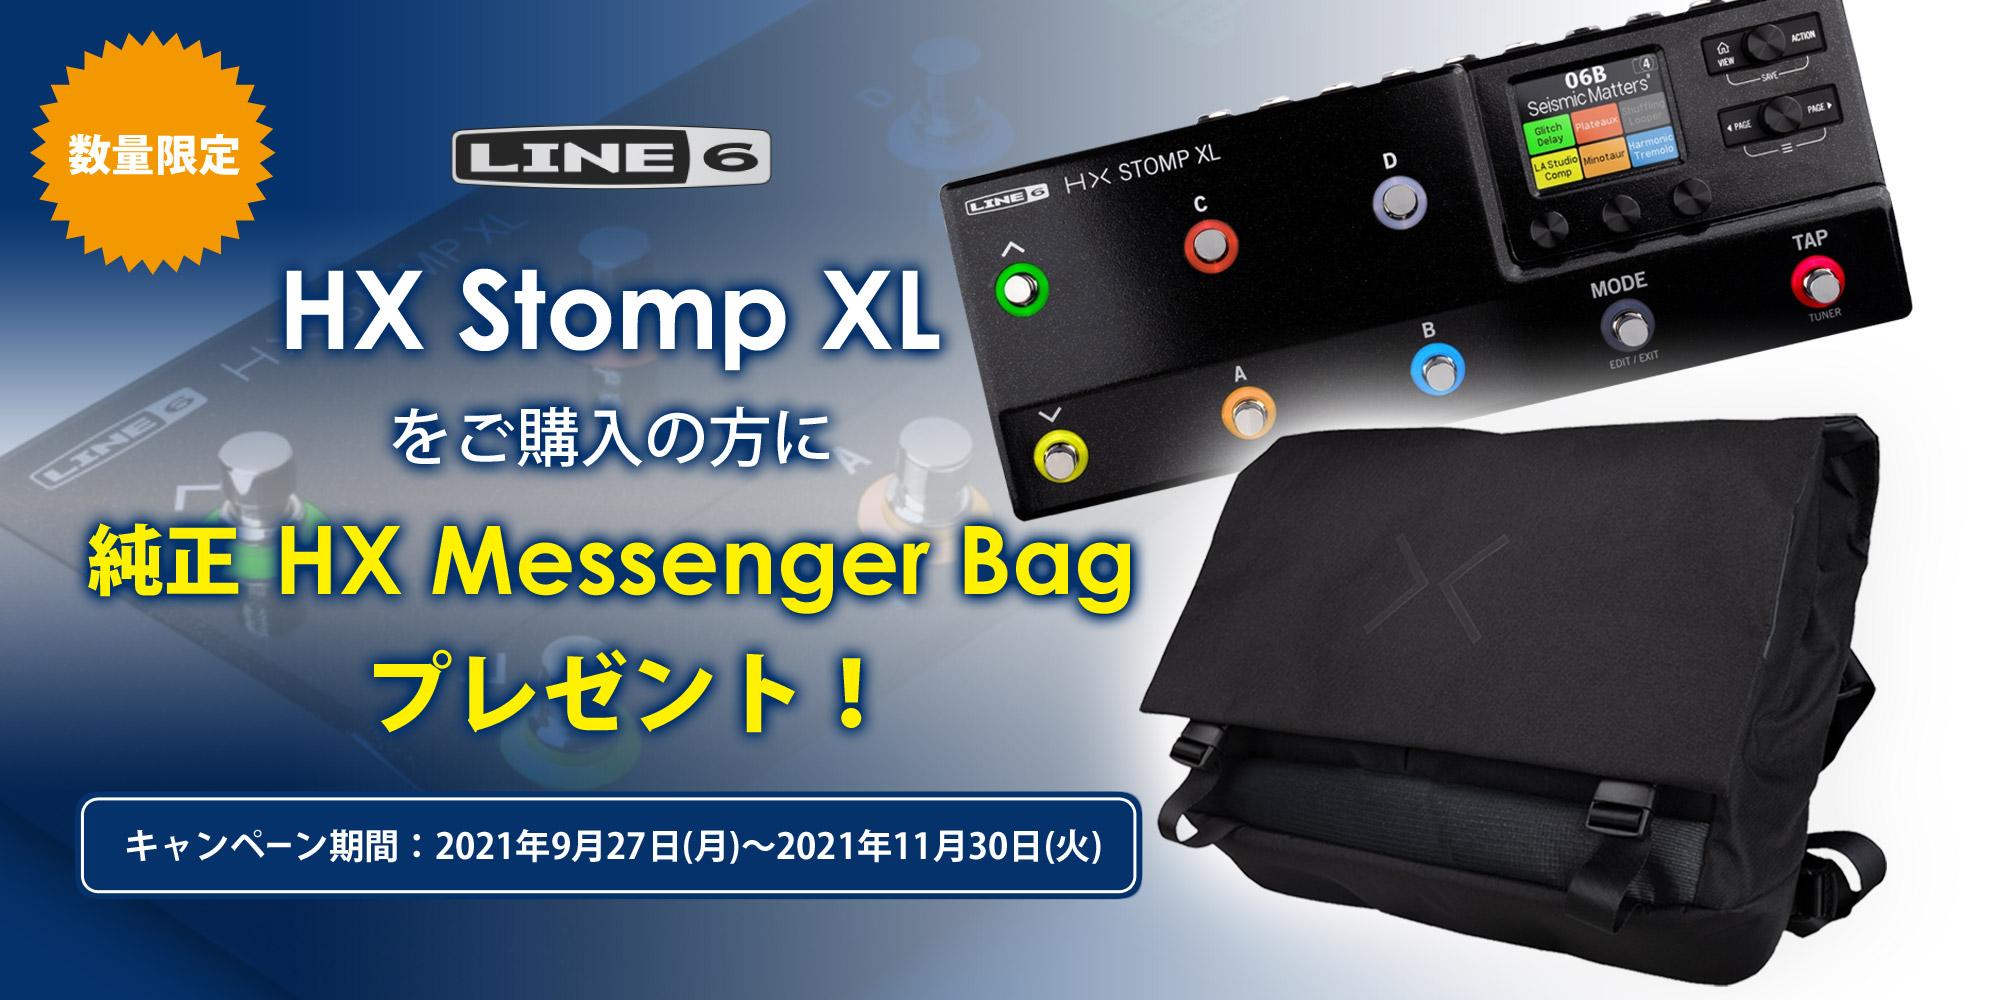 LINE6 HX Messenger Bagプレゼント・キャンペーン【イシバシ楽器】